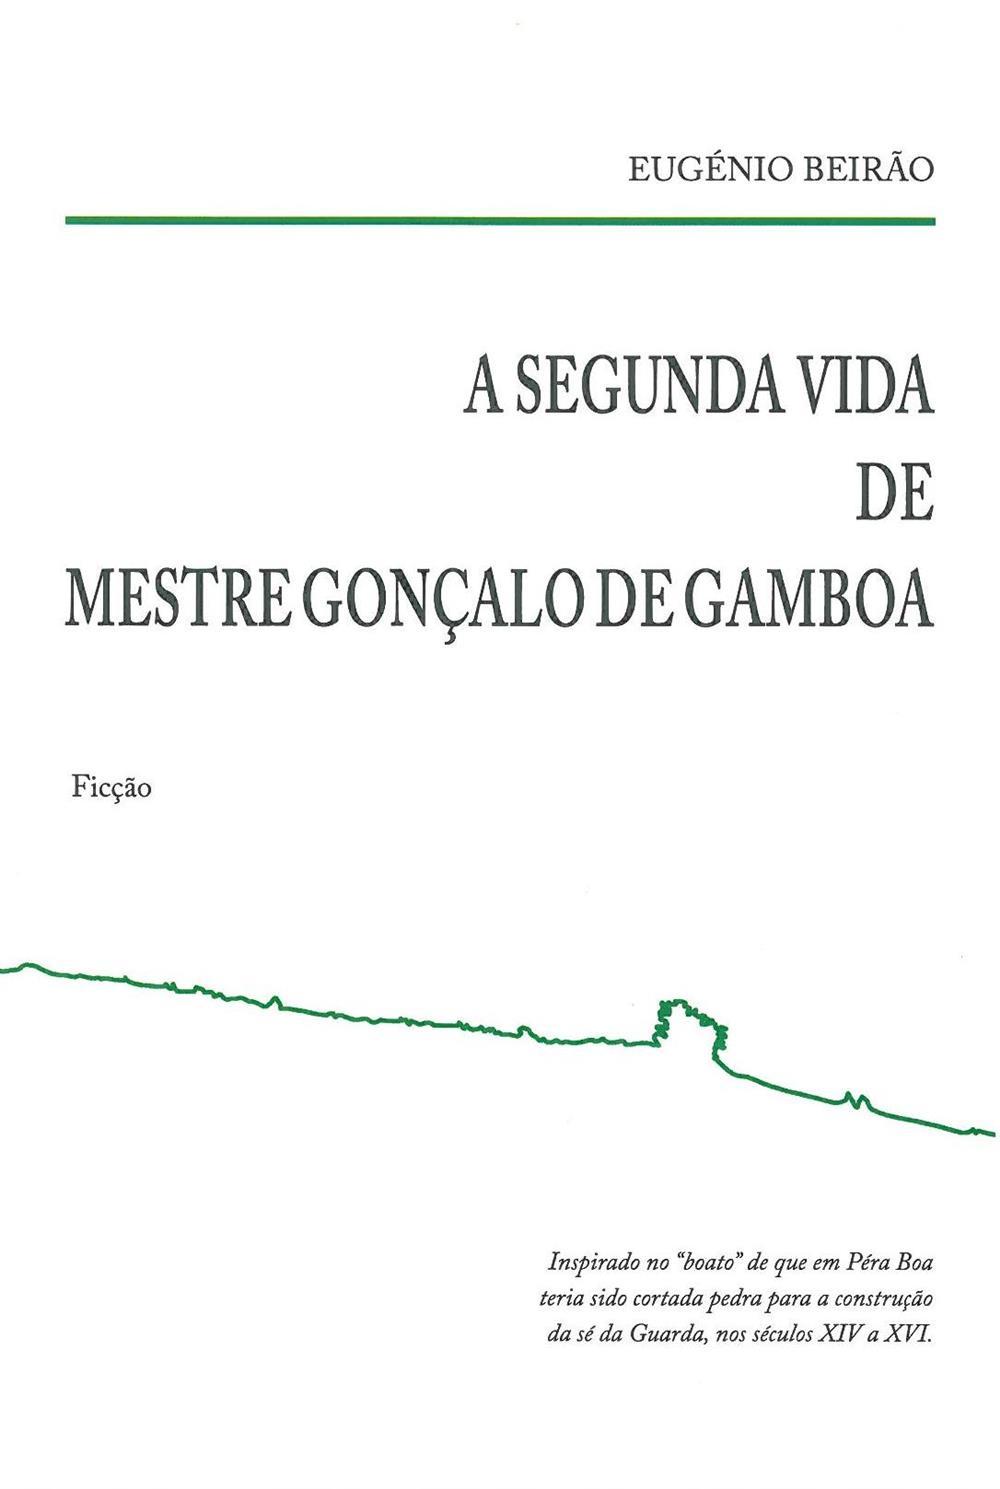 A segunda vida de mestre Gonçalo Gamboa.jpg